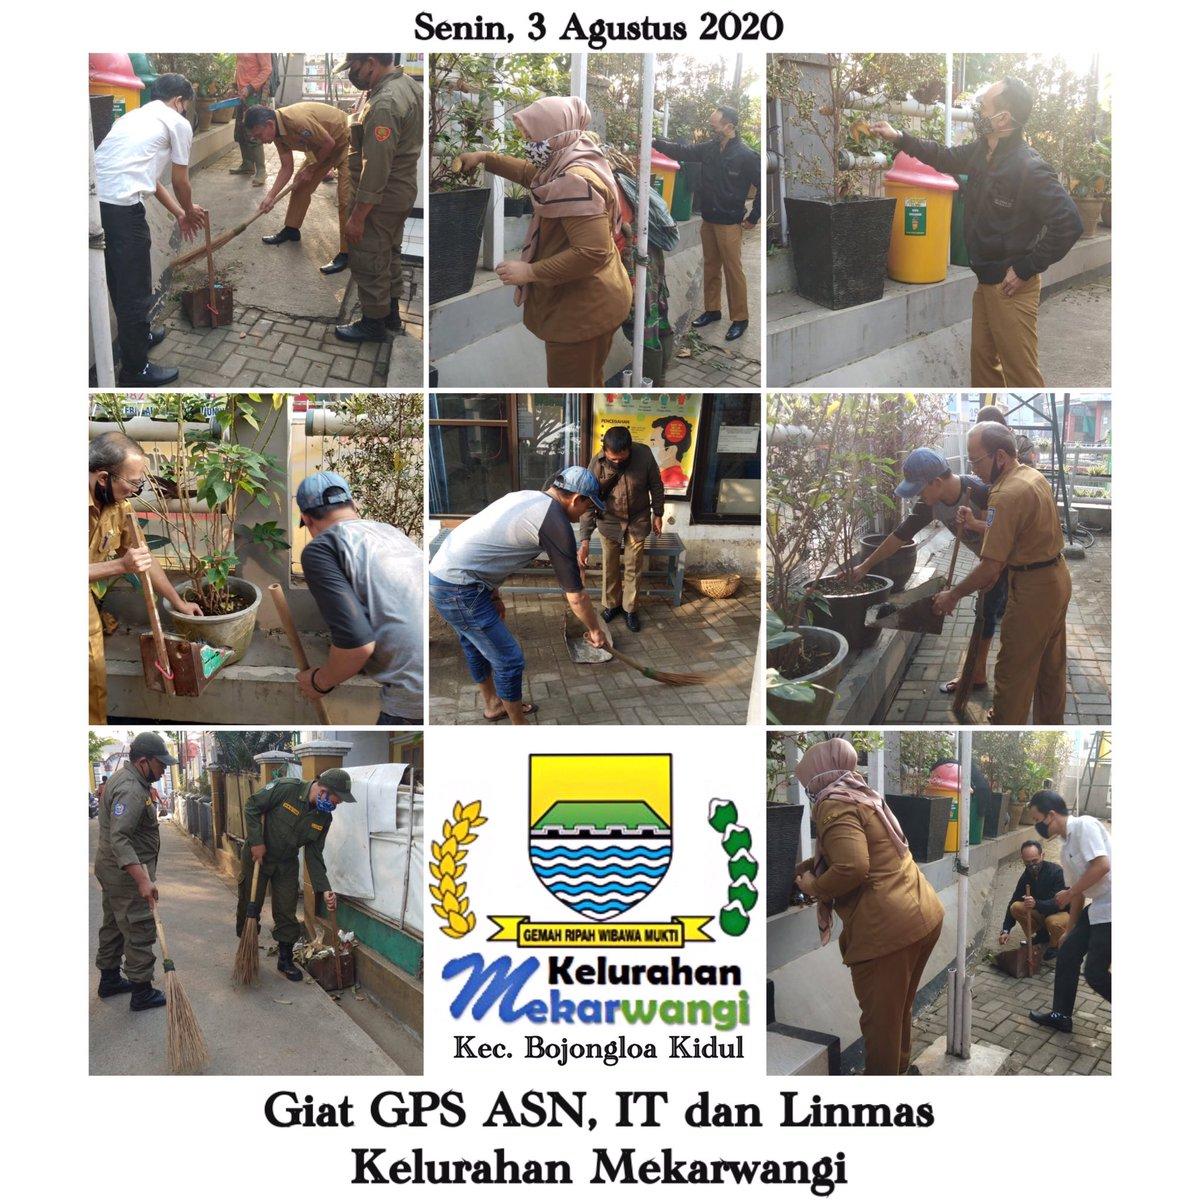 Giat GPS ASN, IT dan Linmas Kelurahan Mekarwangi Kecamatan Bojongloa Kidul Kota Bandung pada hari Senin tanggal 3 Agustus 2020 @OdedMD @kangyanamulyana @pembdg @kecbojkid_ktbdg #bandungjuara #tetapsemangat #bersamakitabisapic.twitter.com/VnVO8sf1yR